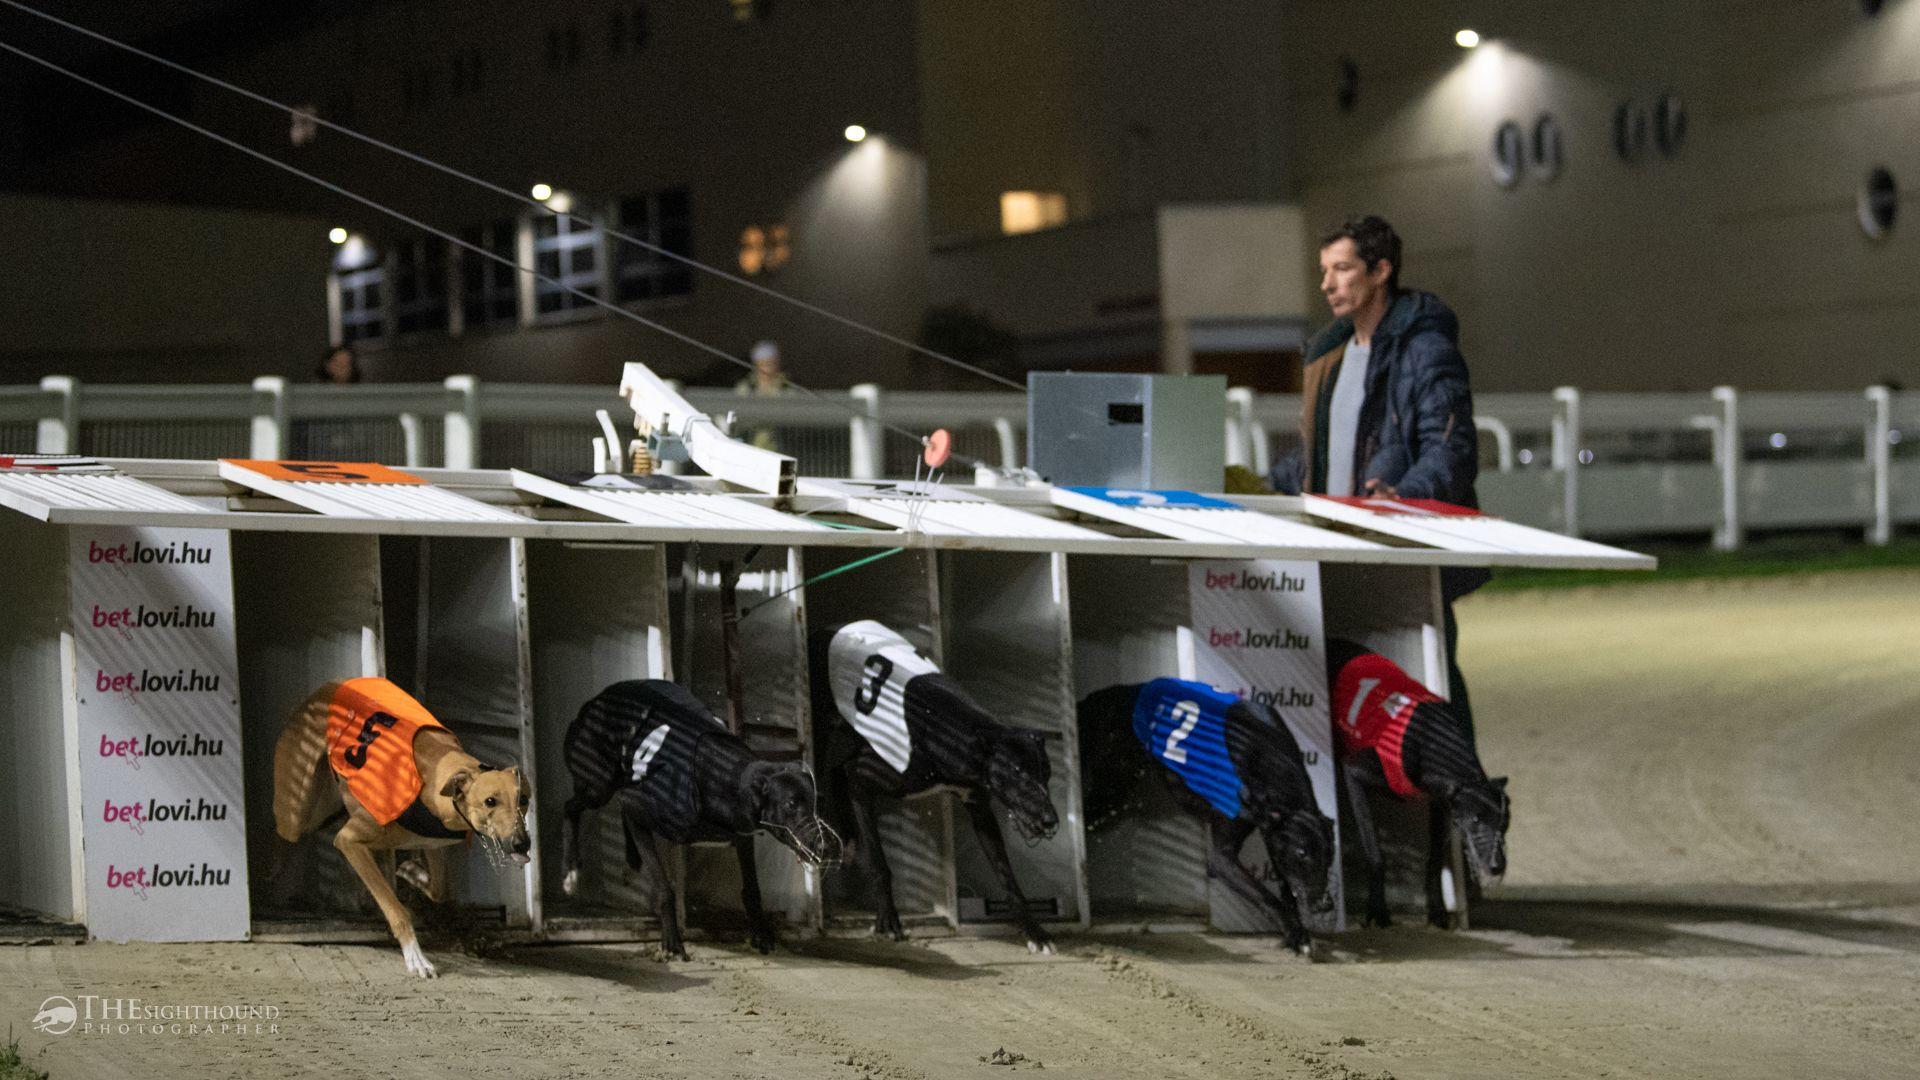 Fotó: The Sighthound Photographer